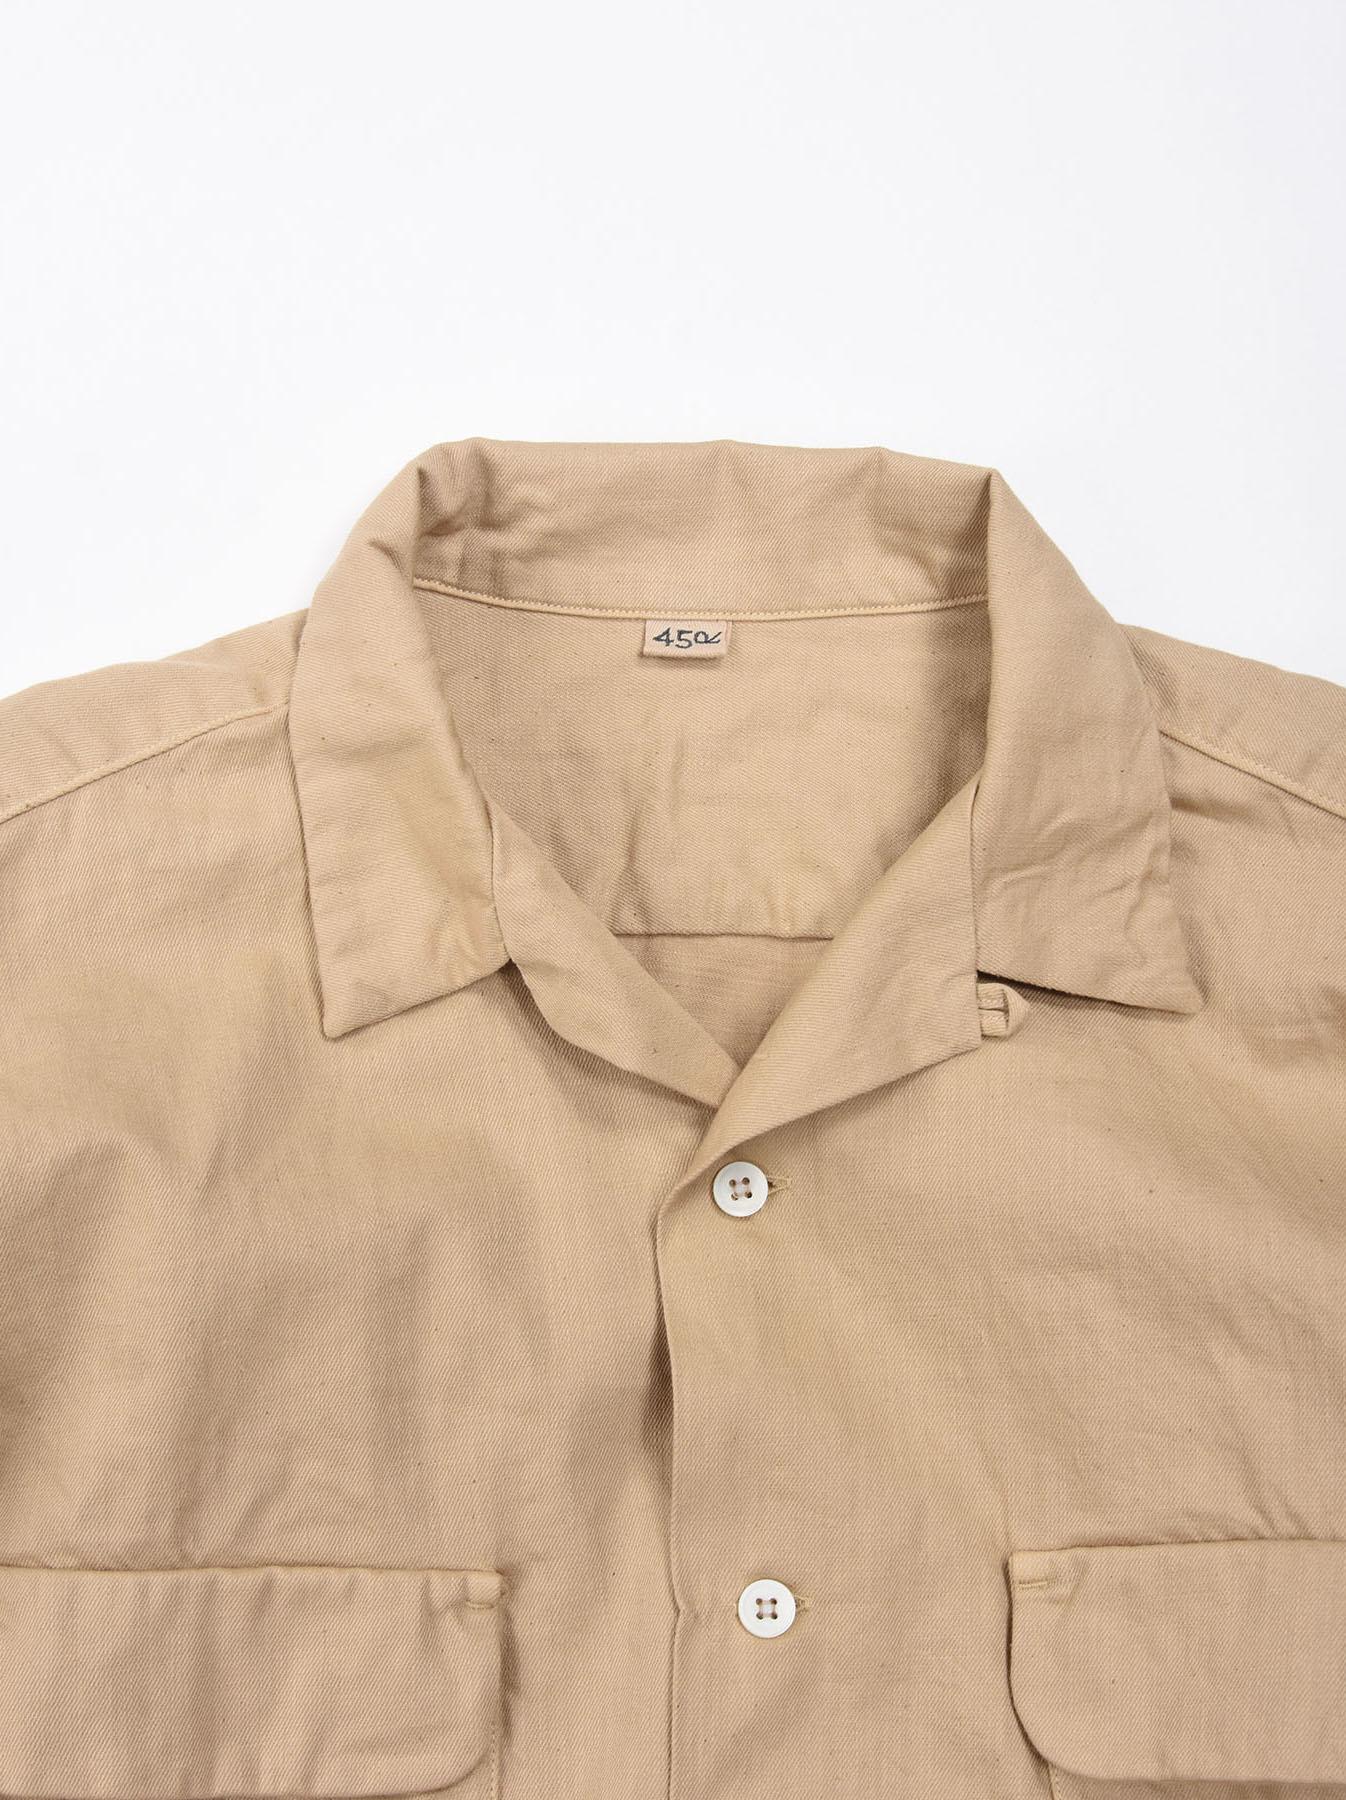 Goma Chino Aloha Shirt-7